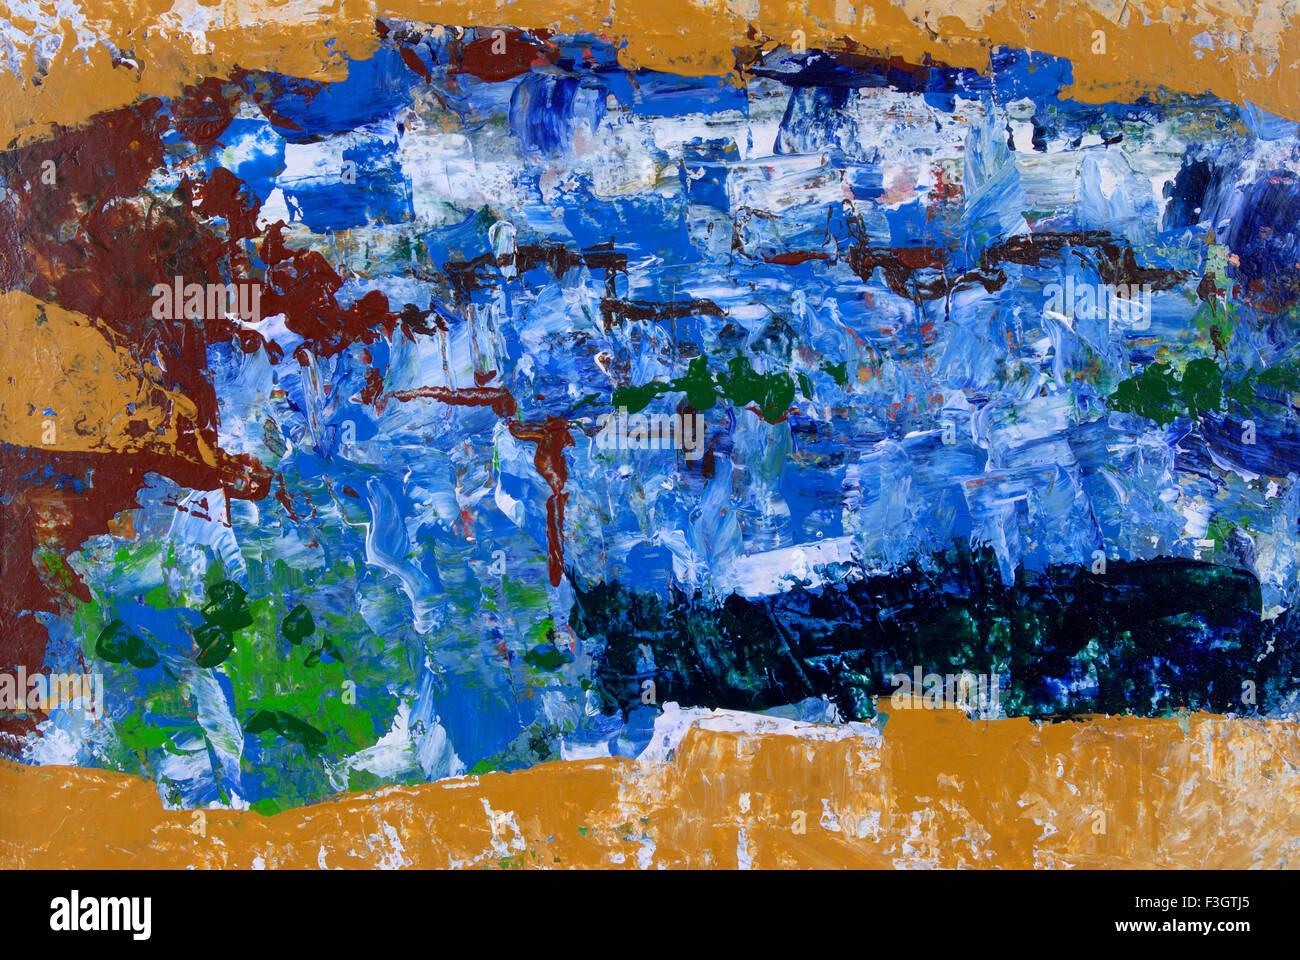 Impression of jodhpur city acrylic colors on handmade paper - Stock Image